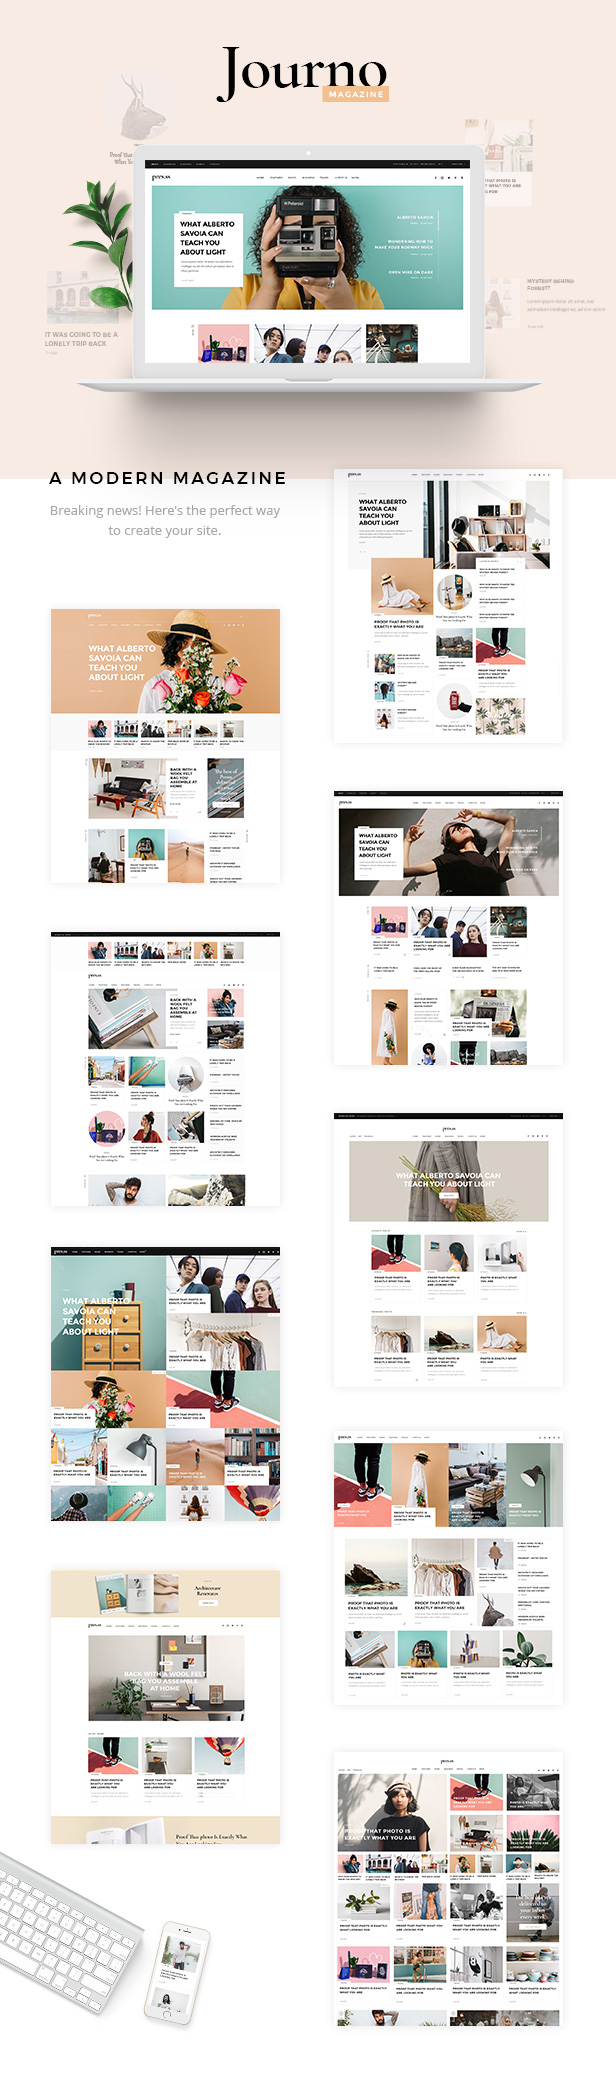 Journo - Creative Magazine & Blog Theme - 1